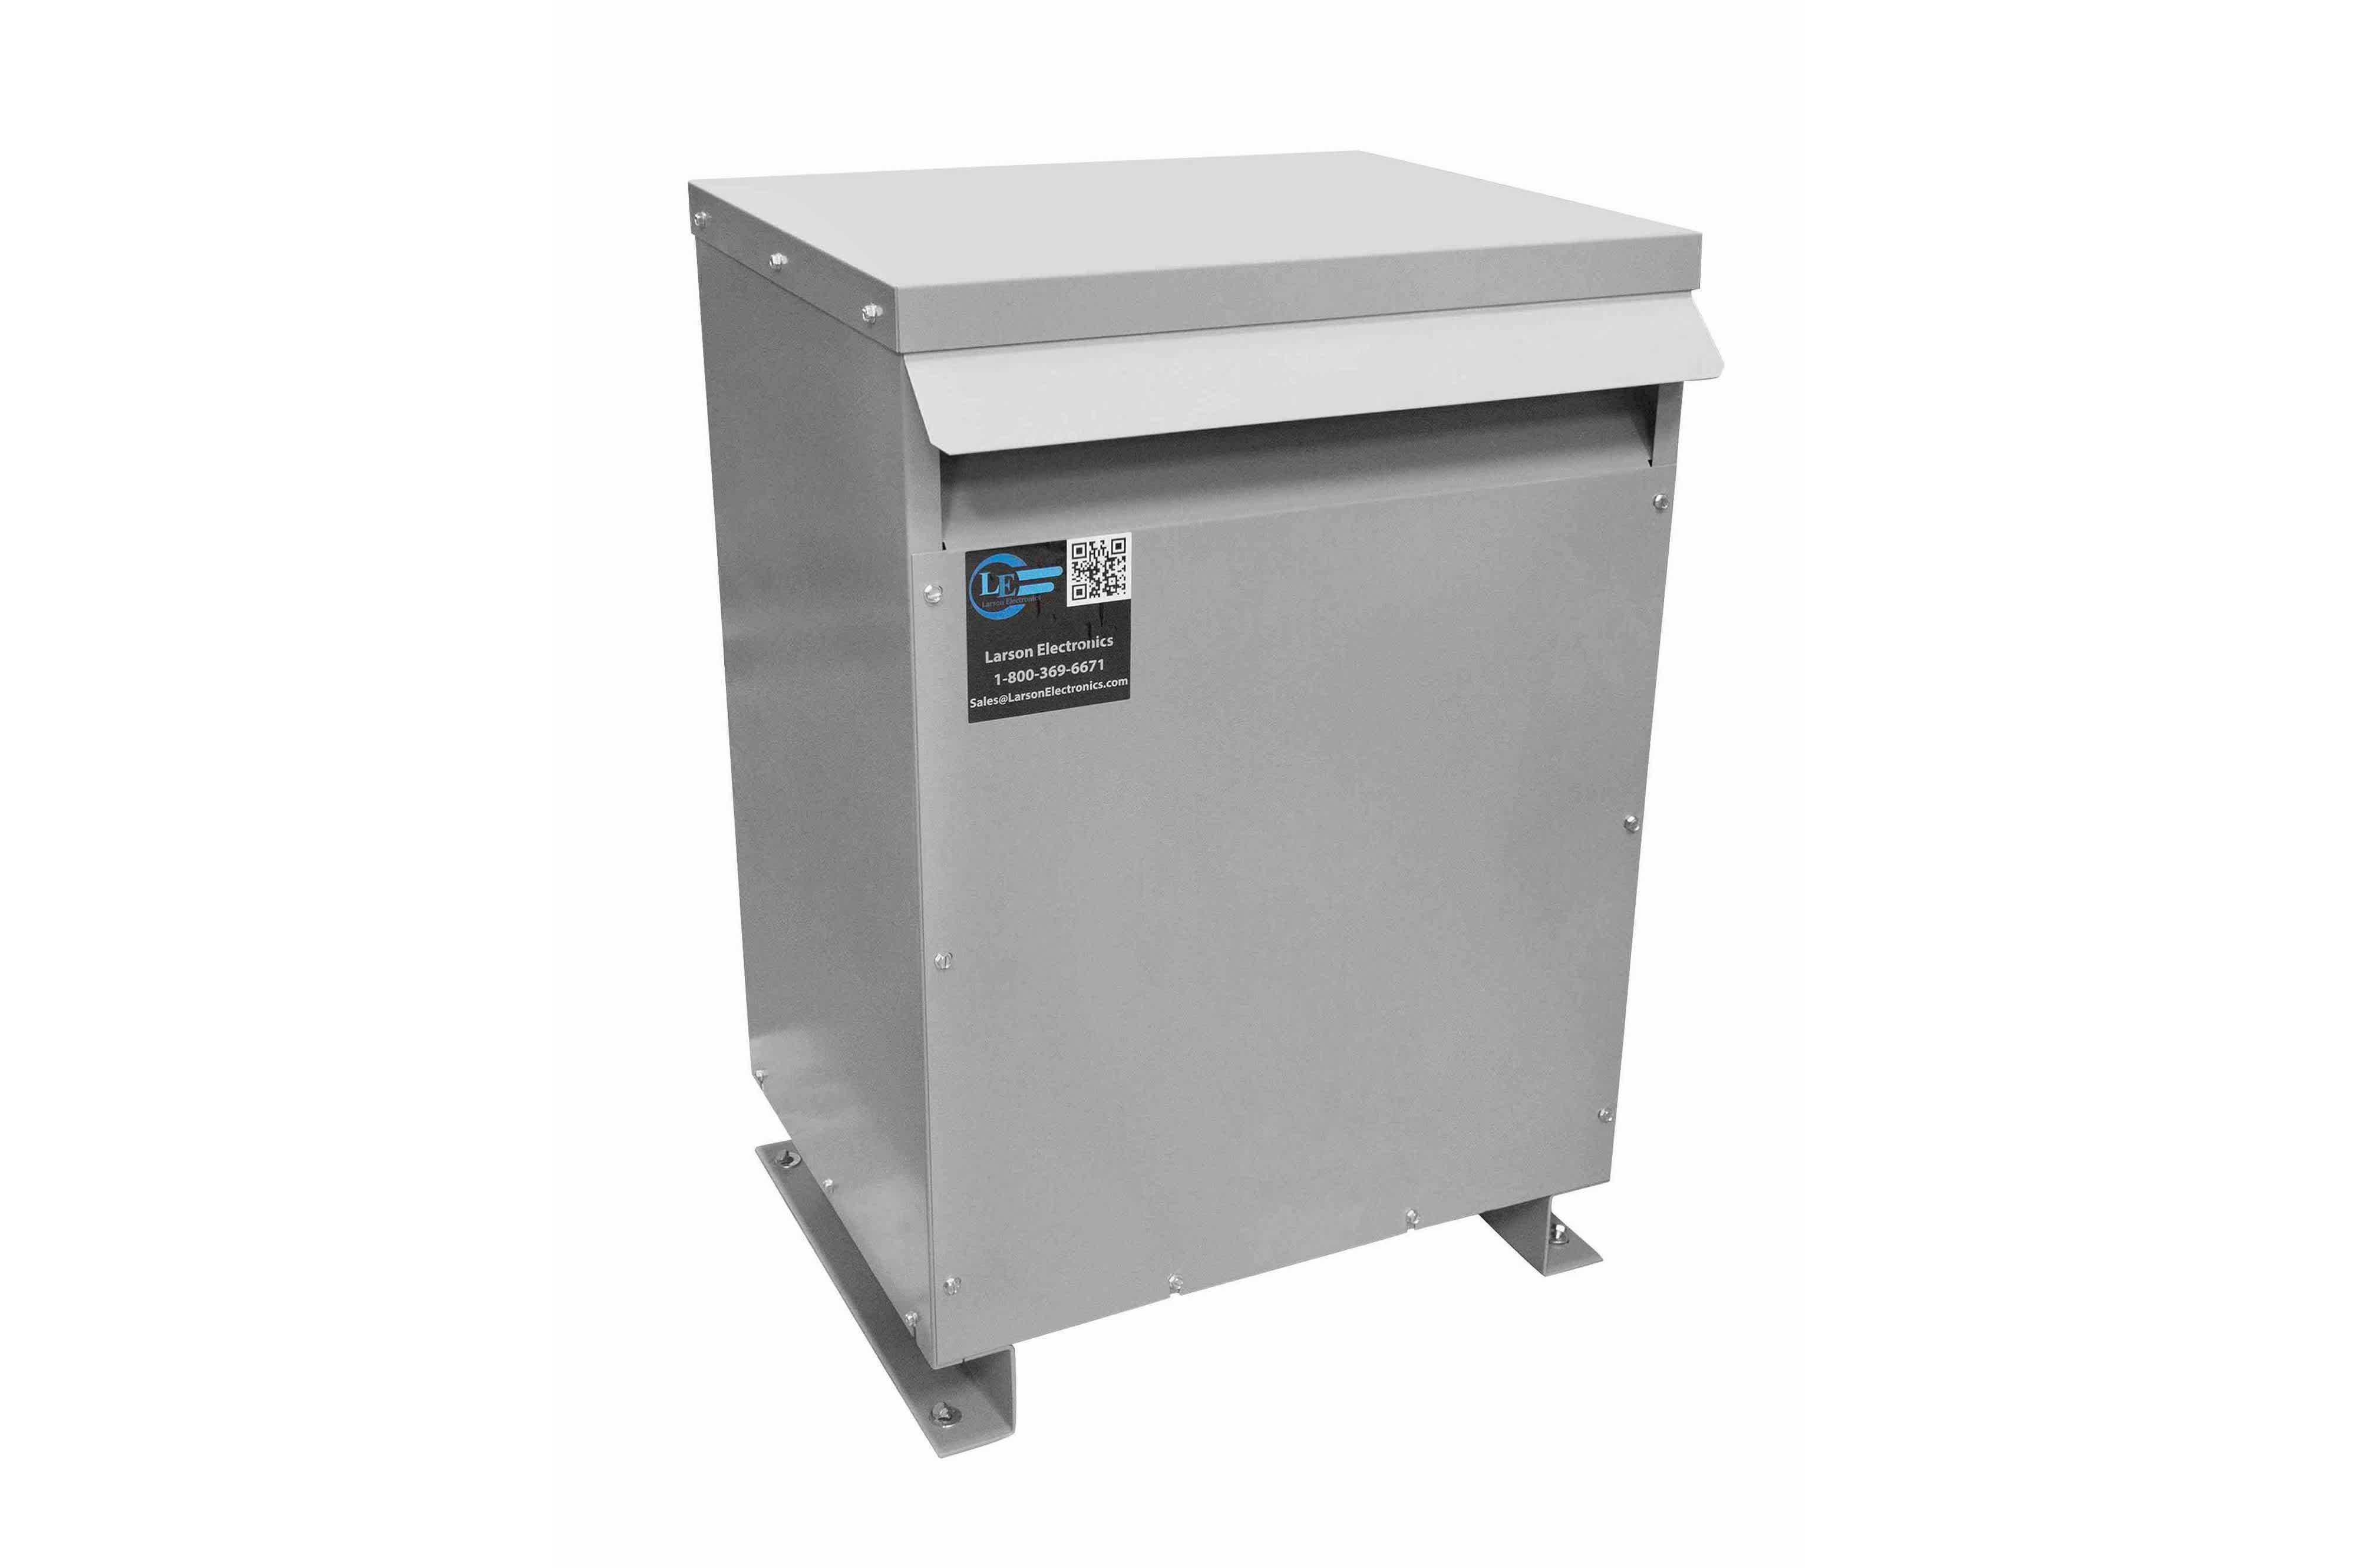 50 kVA 3PH Isolation Transformer, 600V Wye Primary, 415Y/240 Wye-N Secondary, N3R, Ventilated, 60 Hz